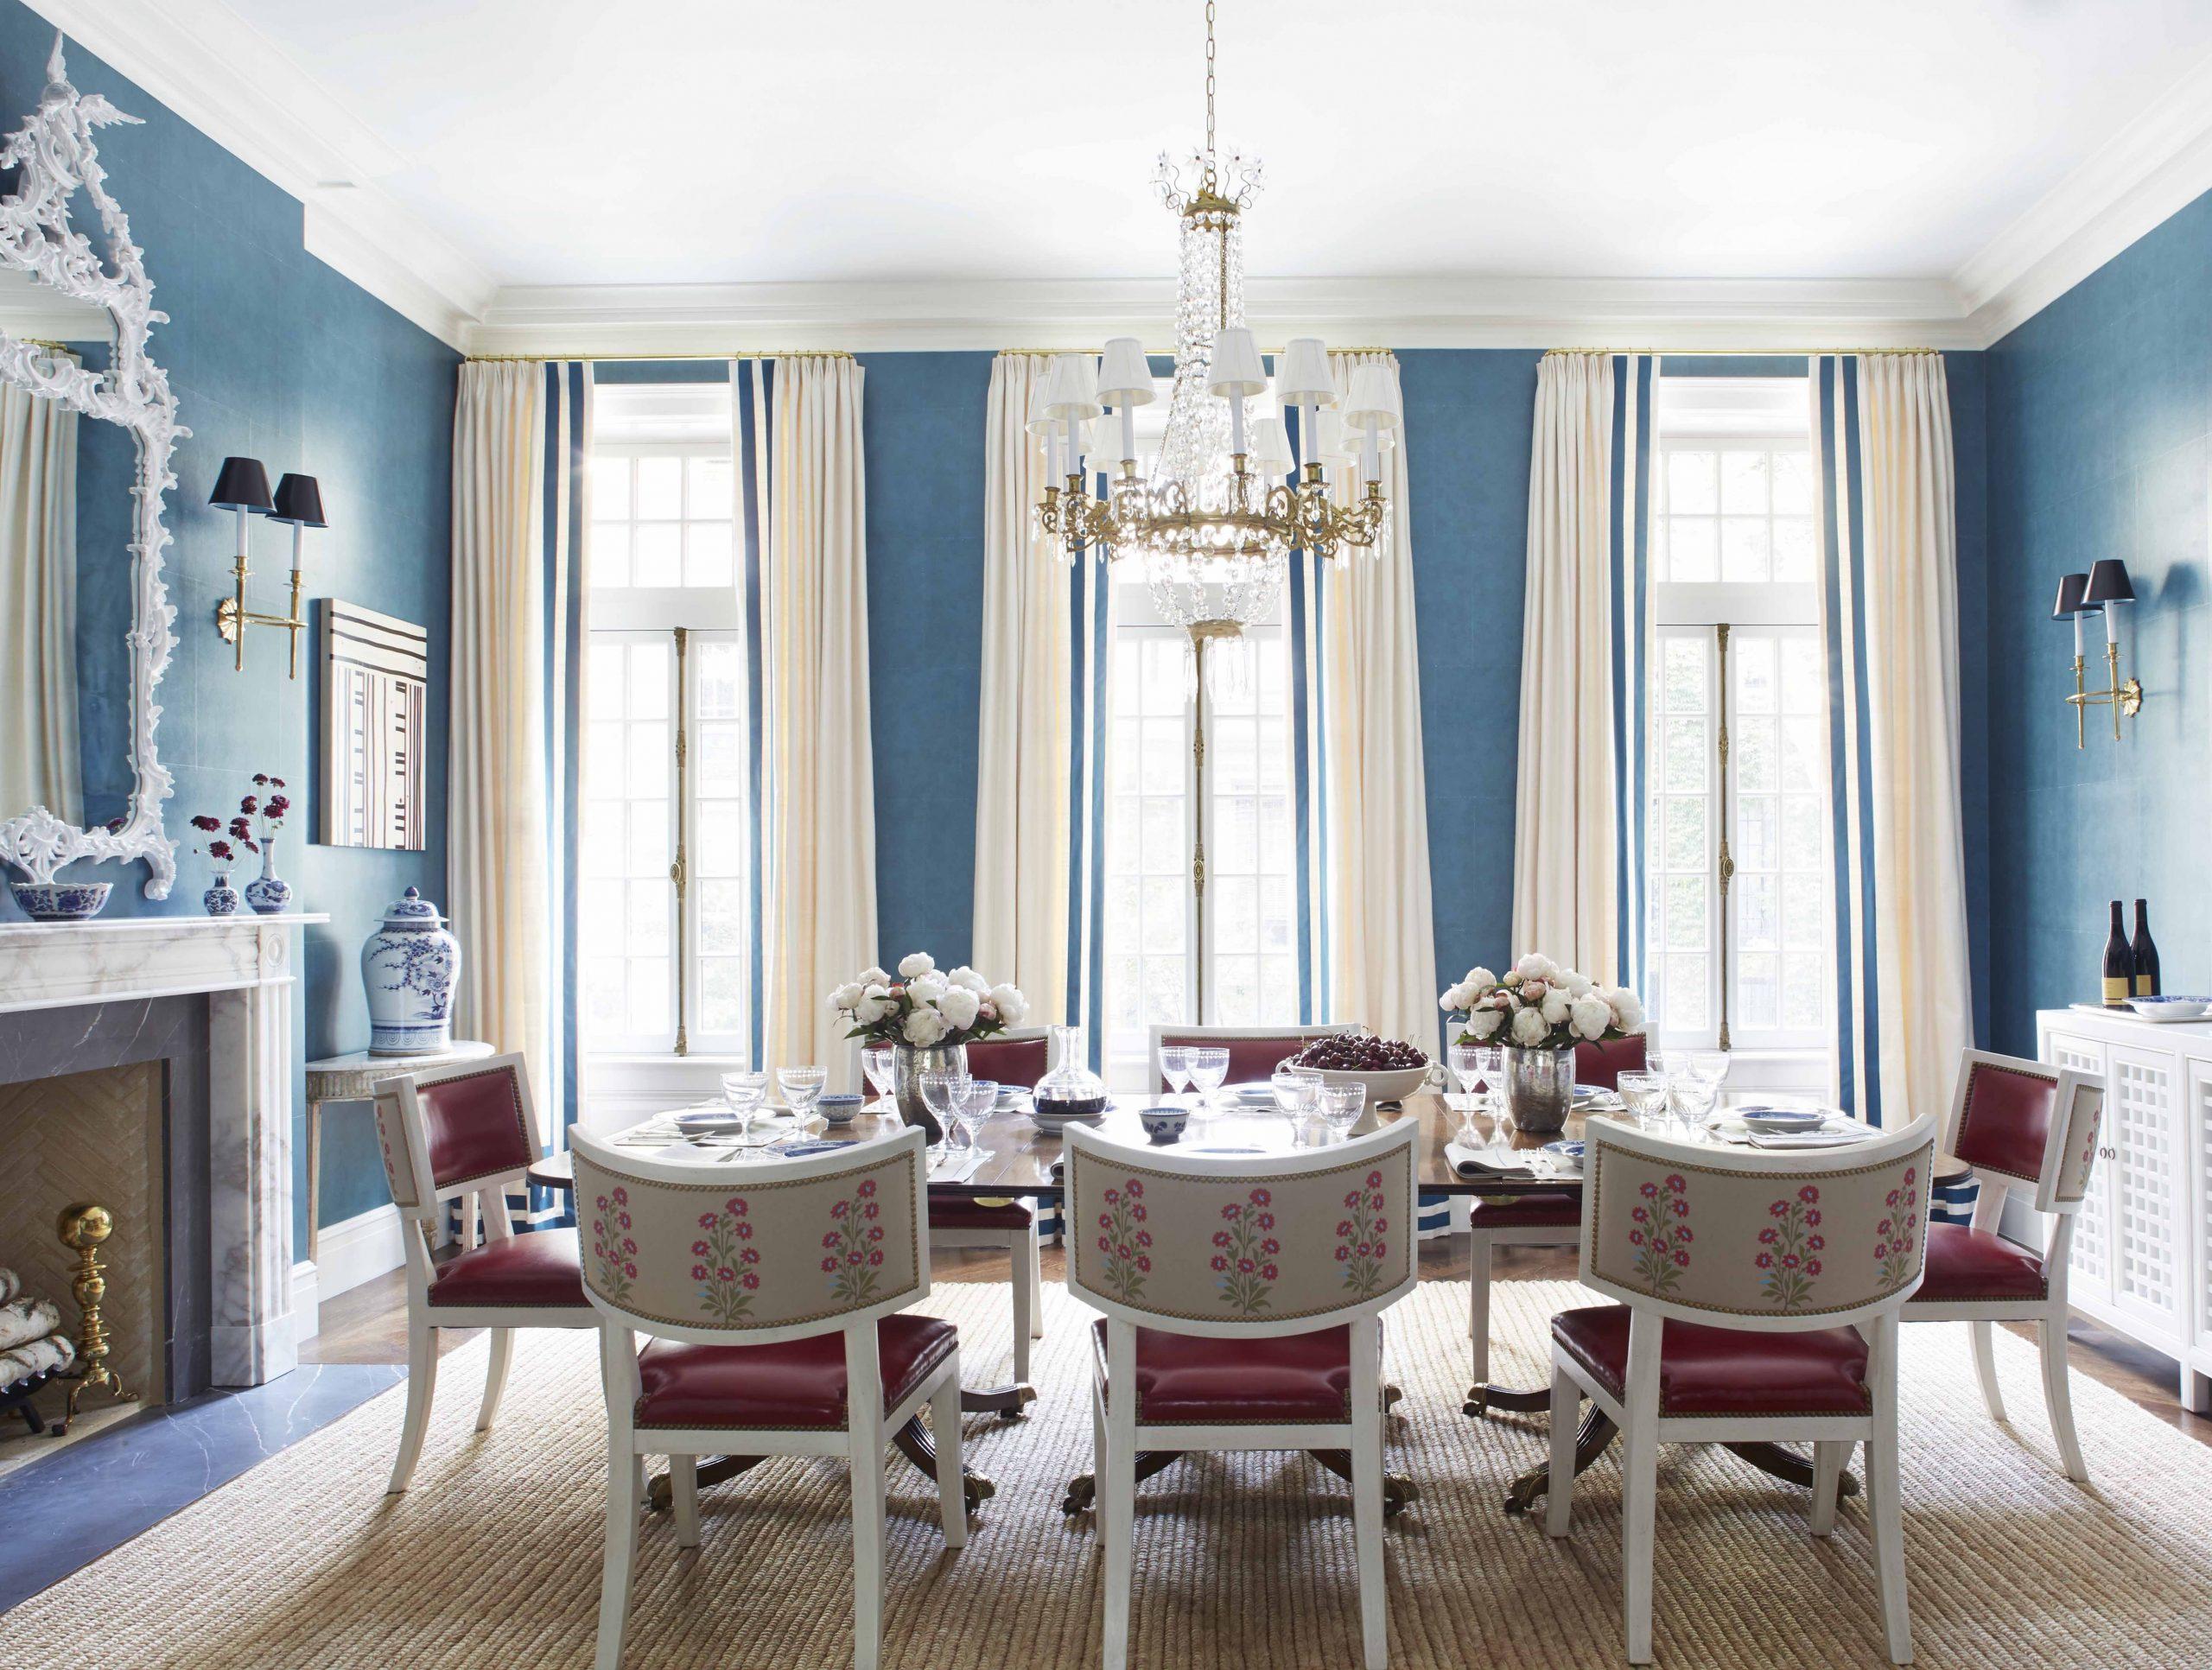 12+ Best Dining Room Ideas – Designer Dining Rooms & Decor - Dining Room Update Ideas